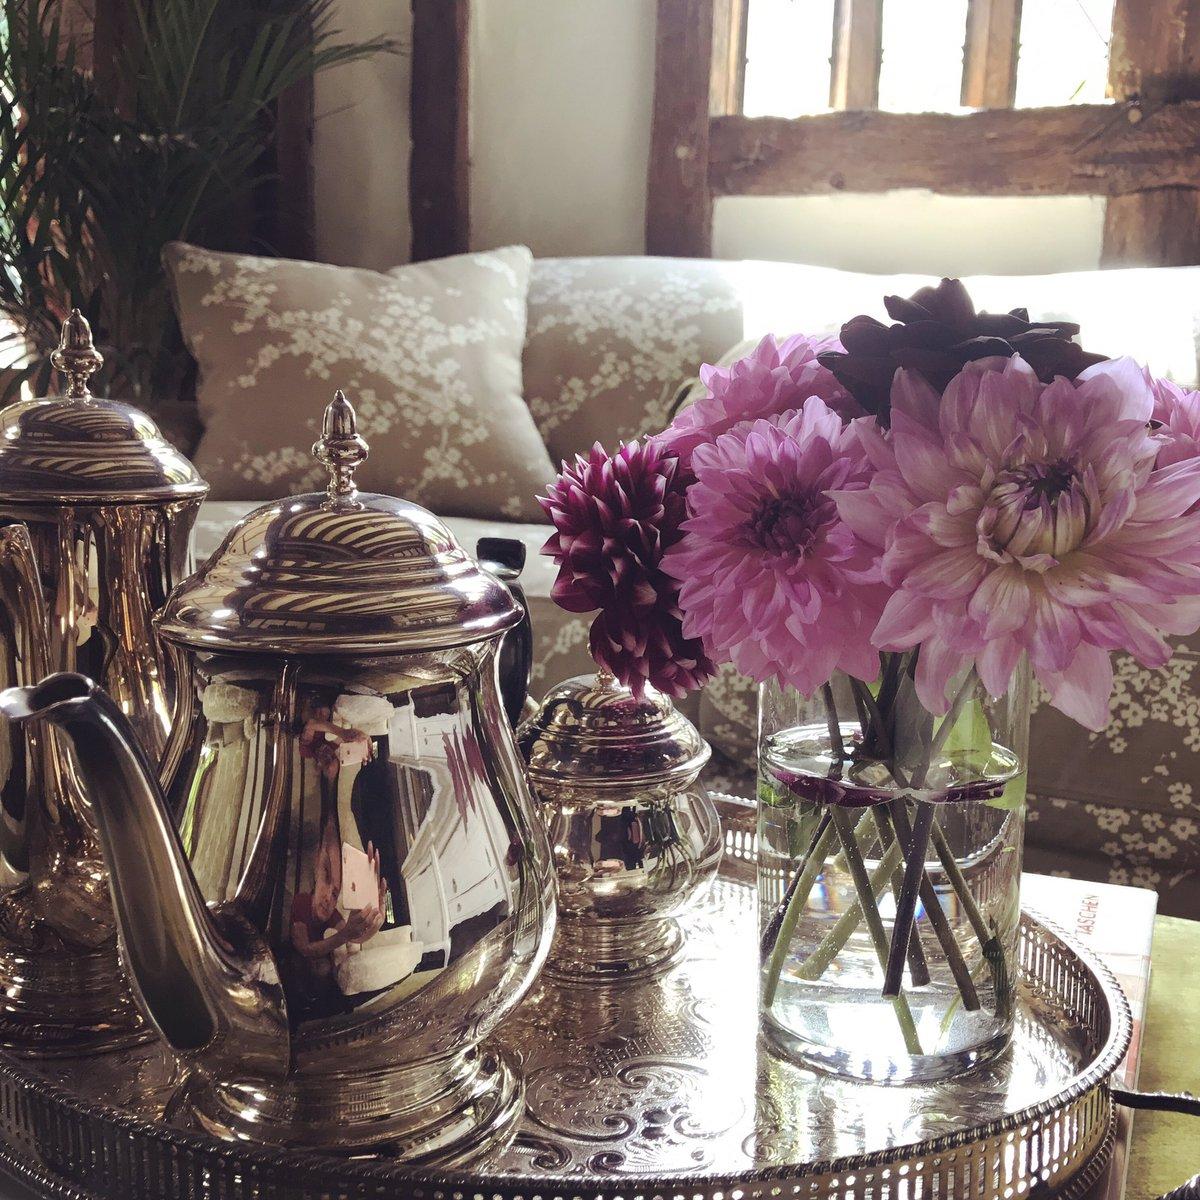 Fresh Dahlias From My Garden ???? https://t.co/vlfMImmhqr